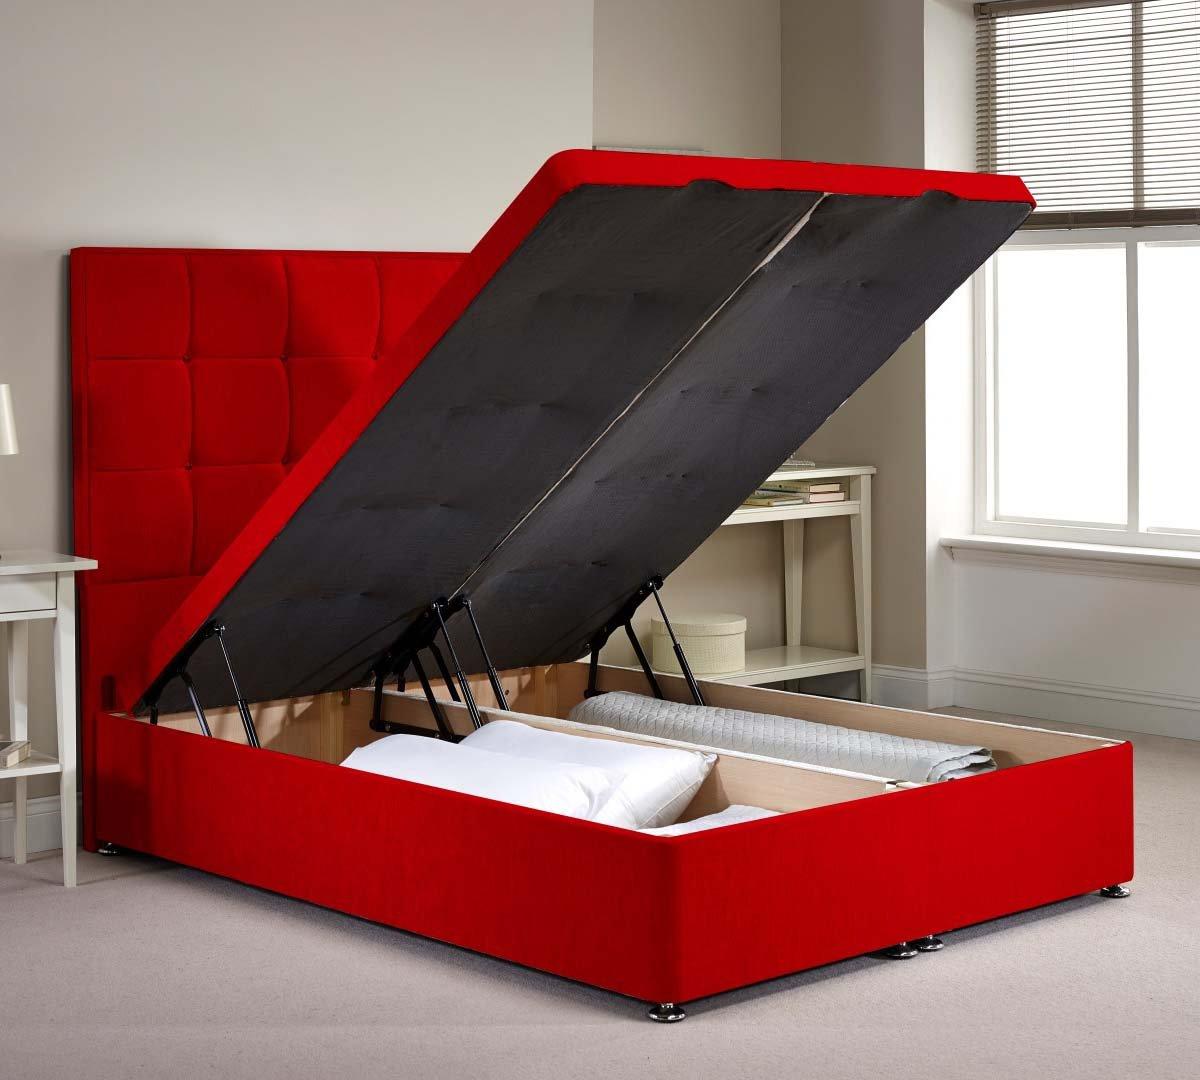 Appian Diván cama otomana marco - rojo felpilla tela - King - 5 FT 0 ...